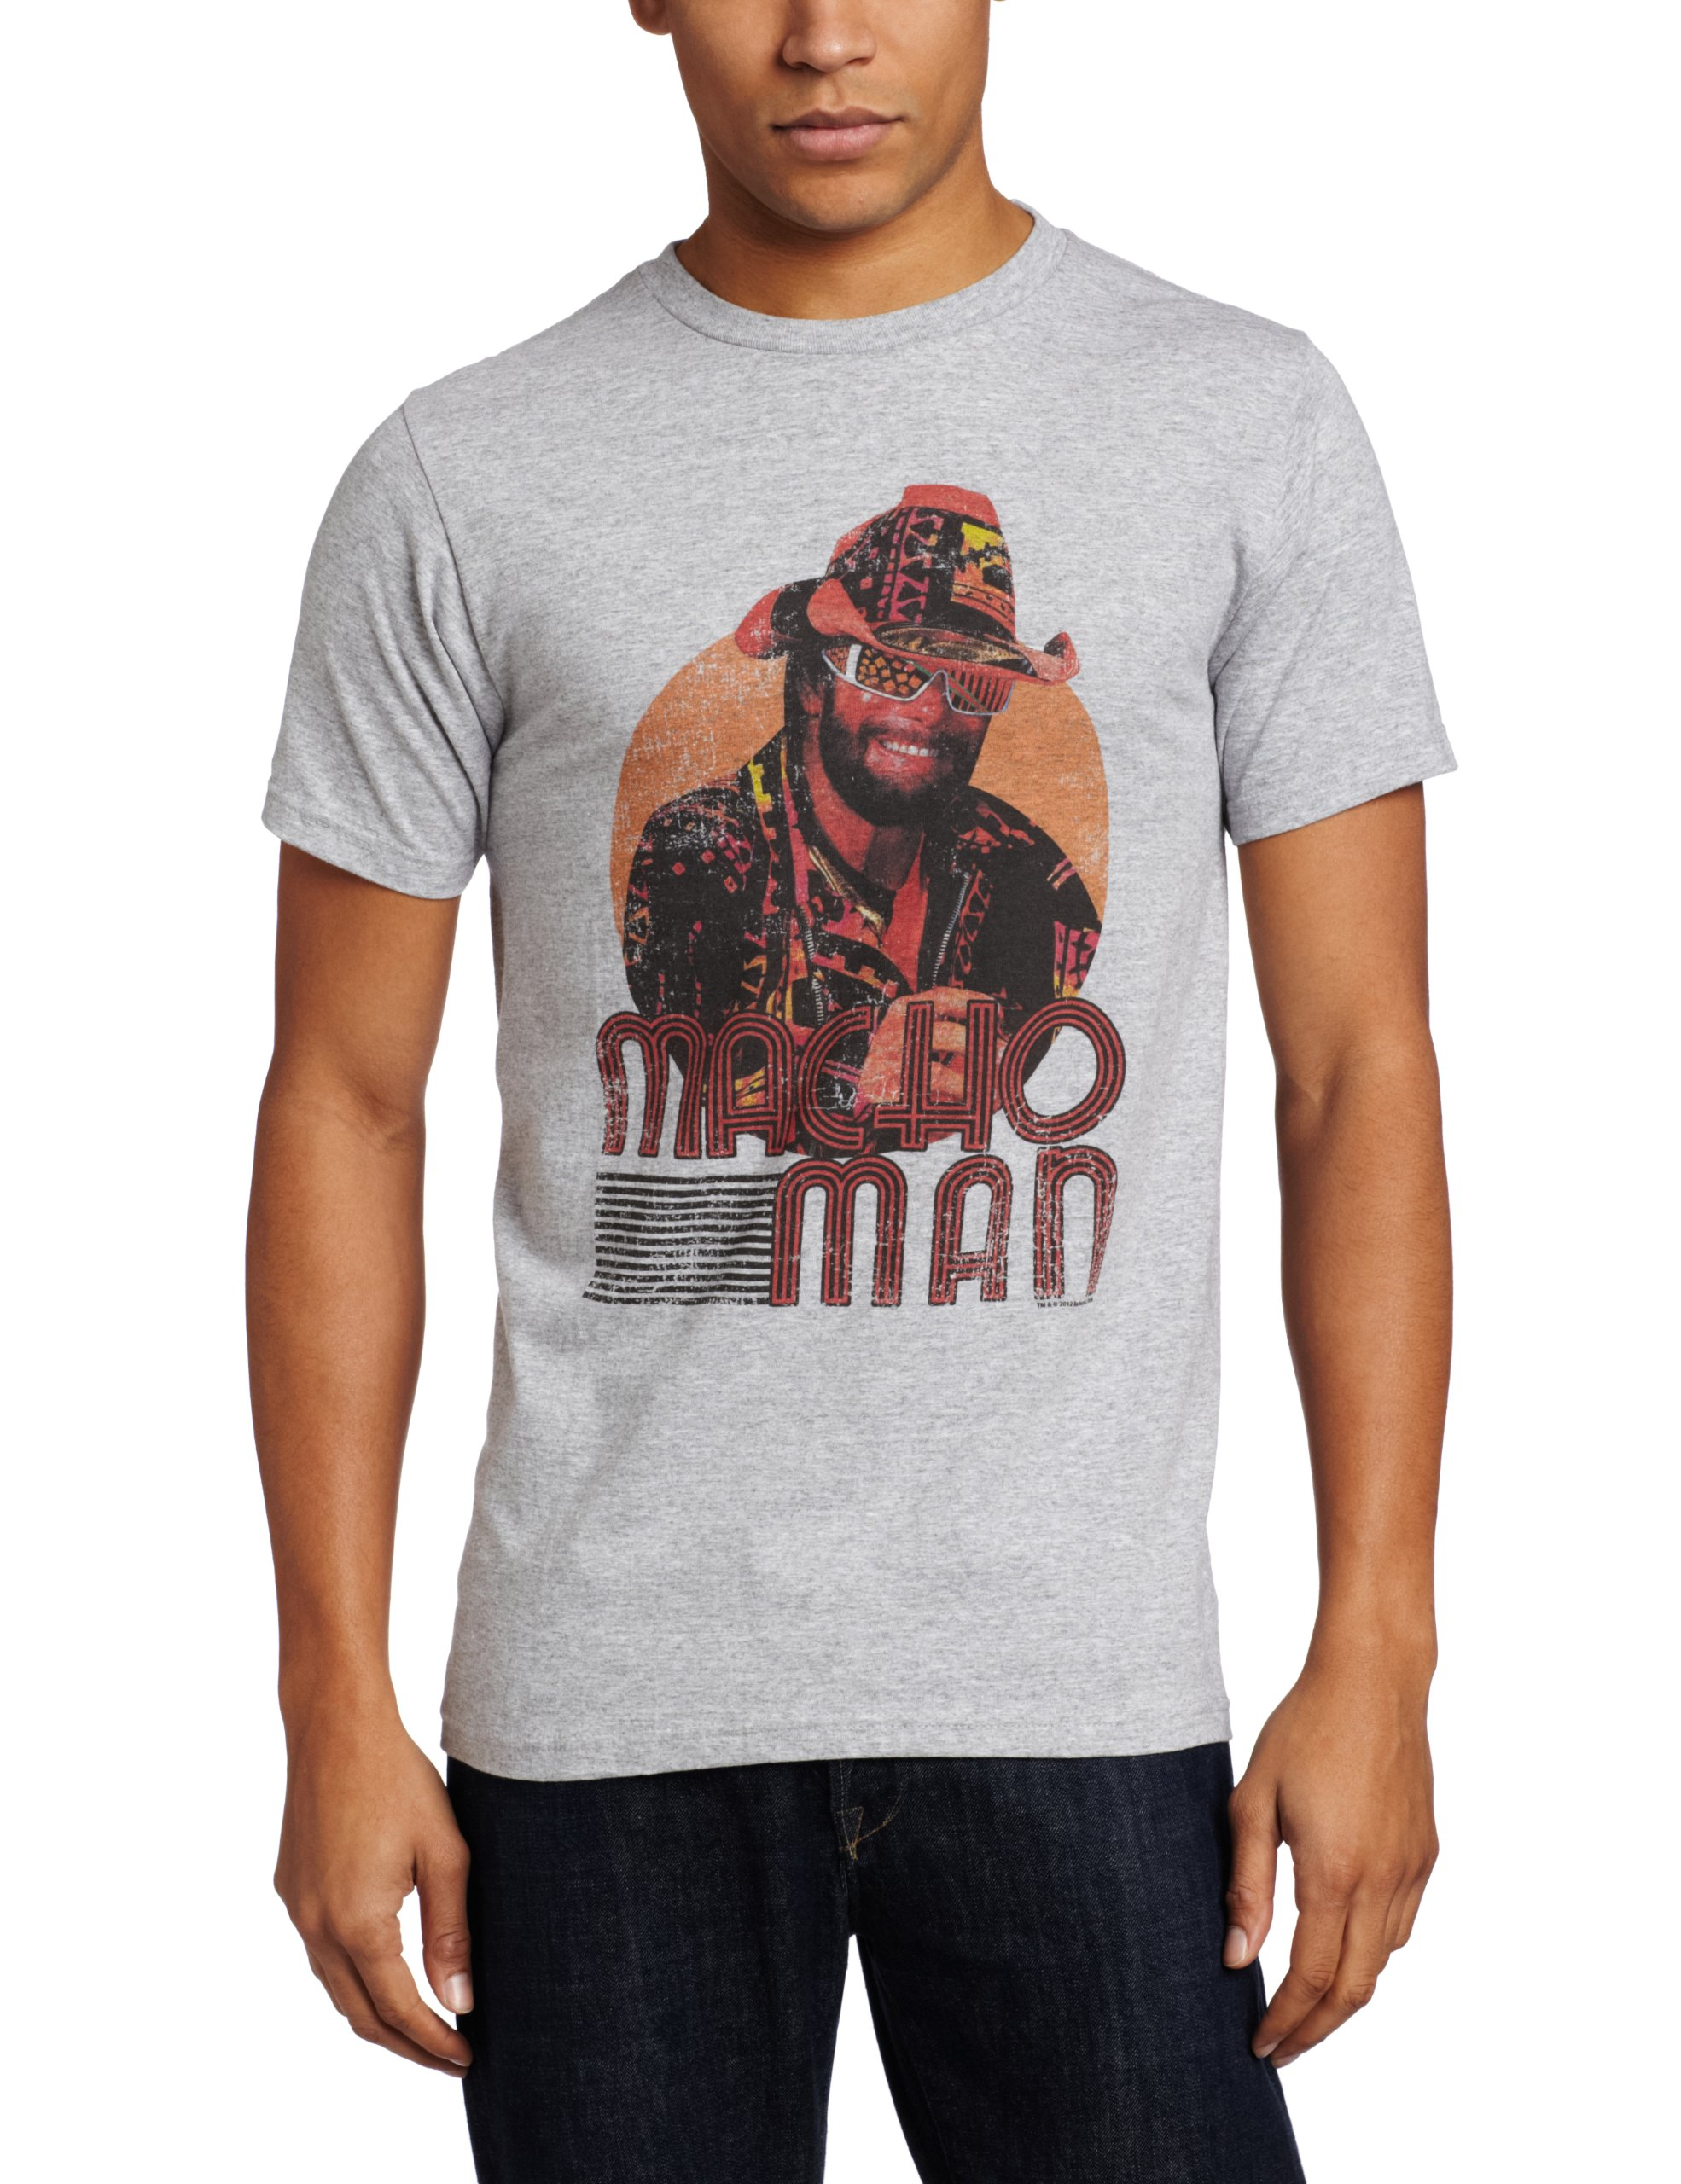 American Classics Men's Macho Man Mackin' and Smackin' T-Shirt, Gray, Large